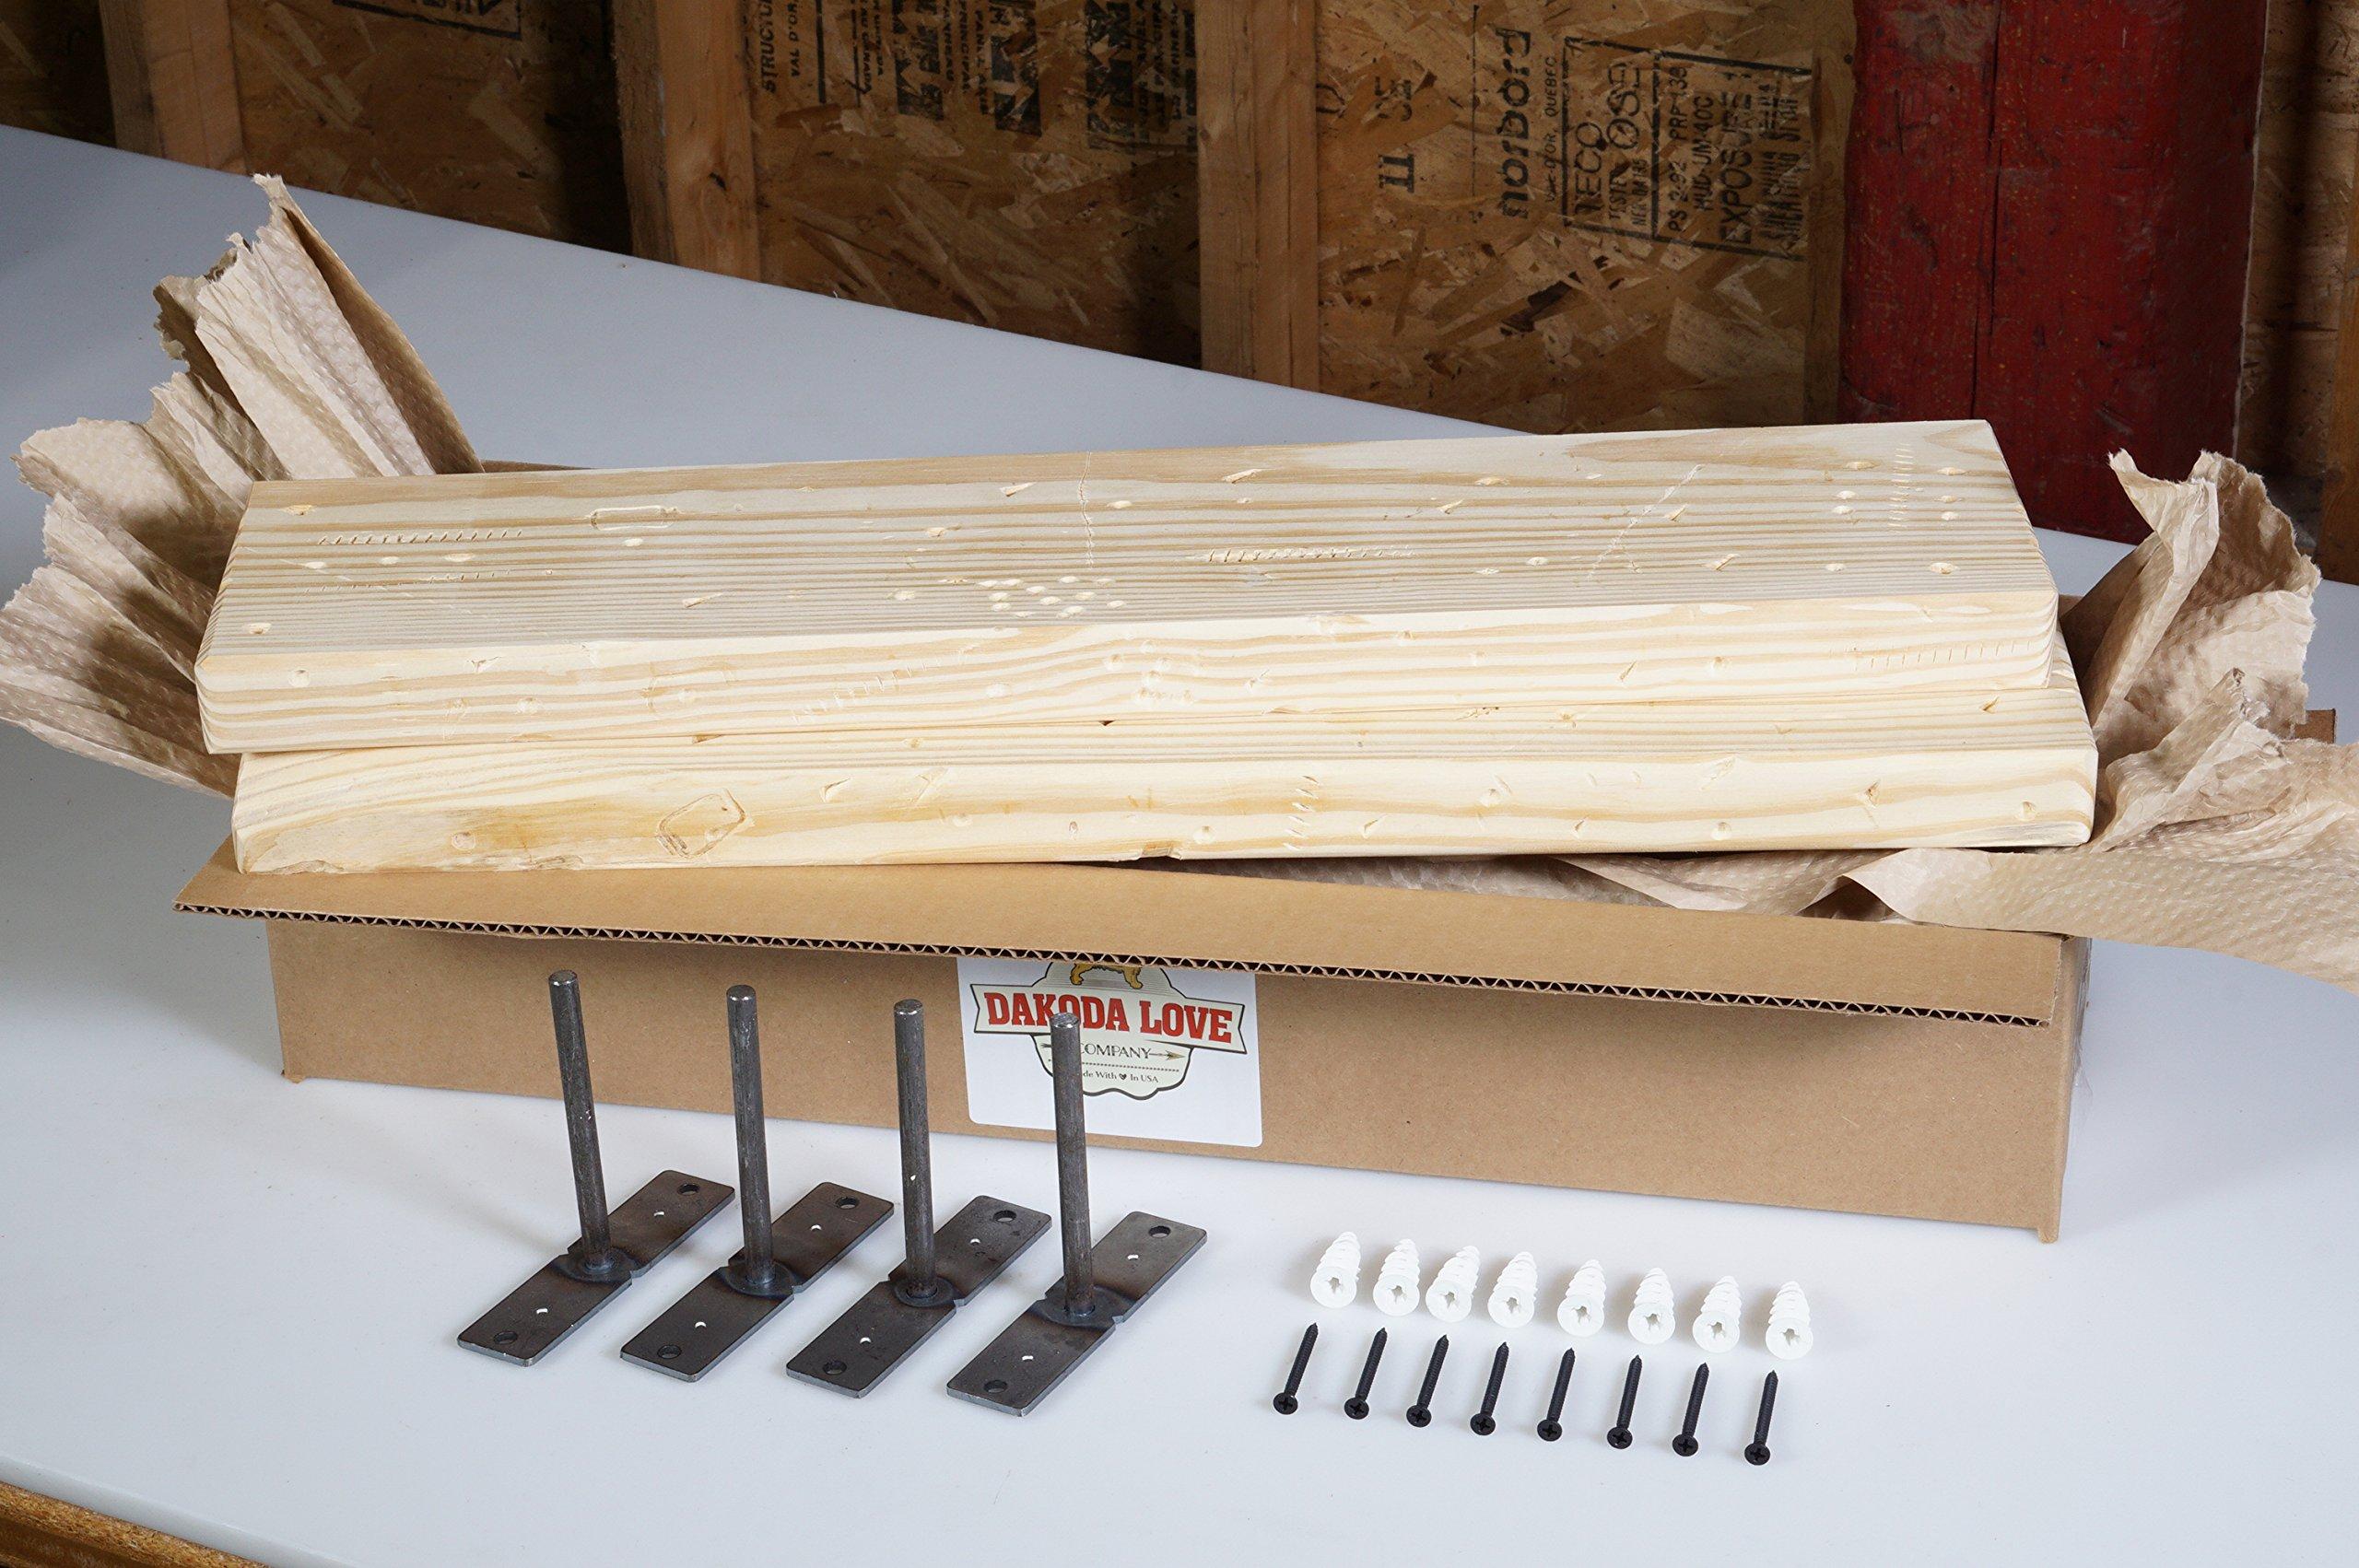 DAKODA LOVE 5.25'' Deep Rugged Distressed Floating Shelves, USA Handmade, Ready to Stain, 100% Countersunk Hidden Floating Shelf Brackets, Beautiful Grain Pine Wood Rustic (Set of 2) (24'', Unfinished)